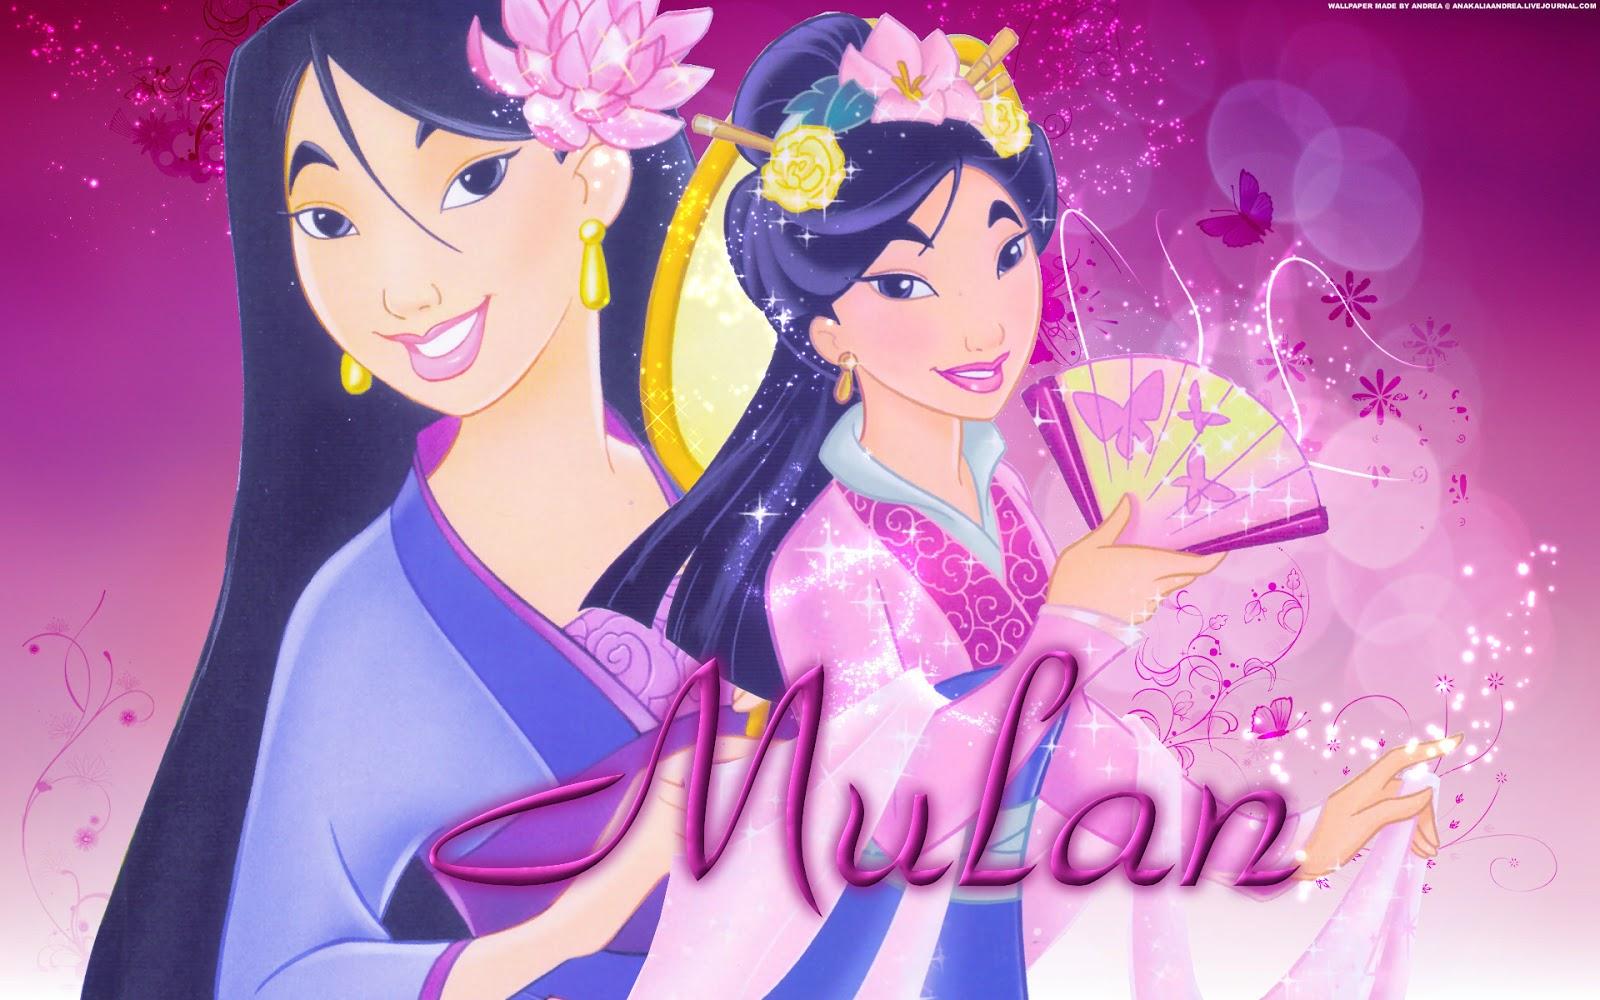 Princess mulan all about princess mulan - Princesse mulan ...